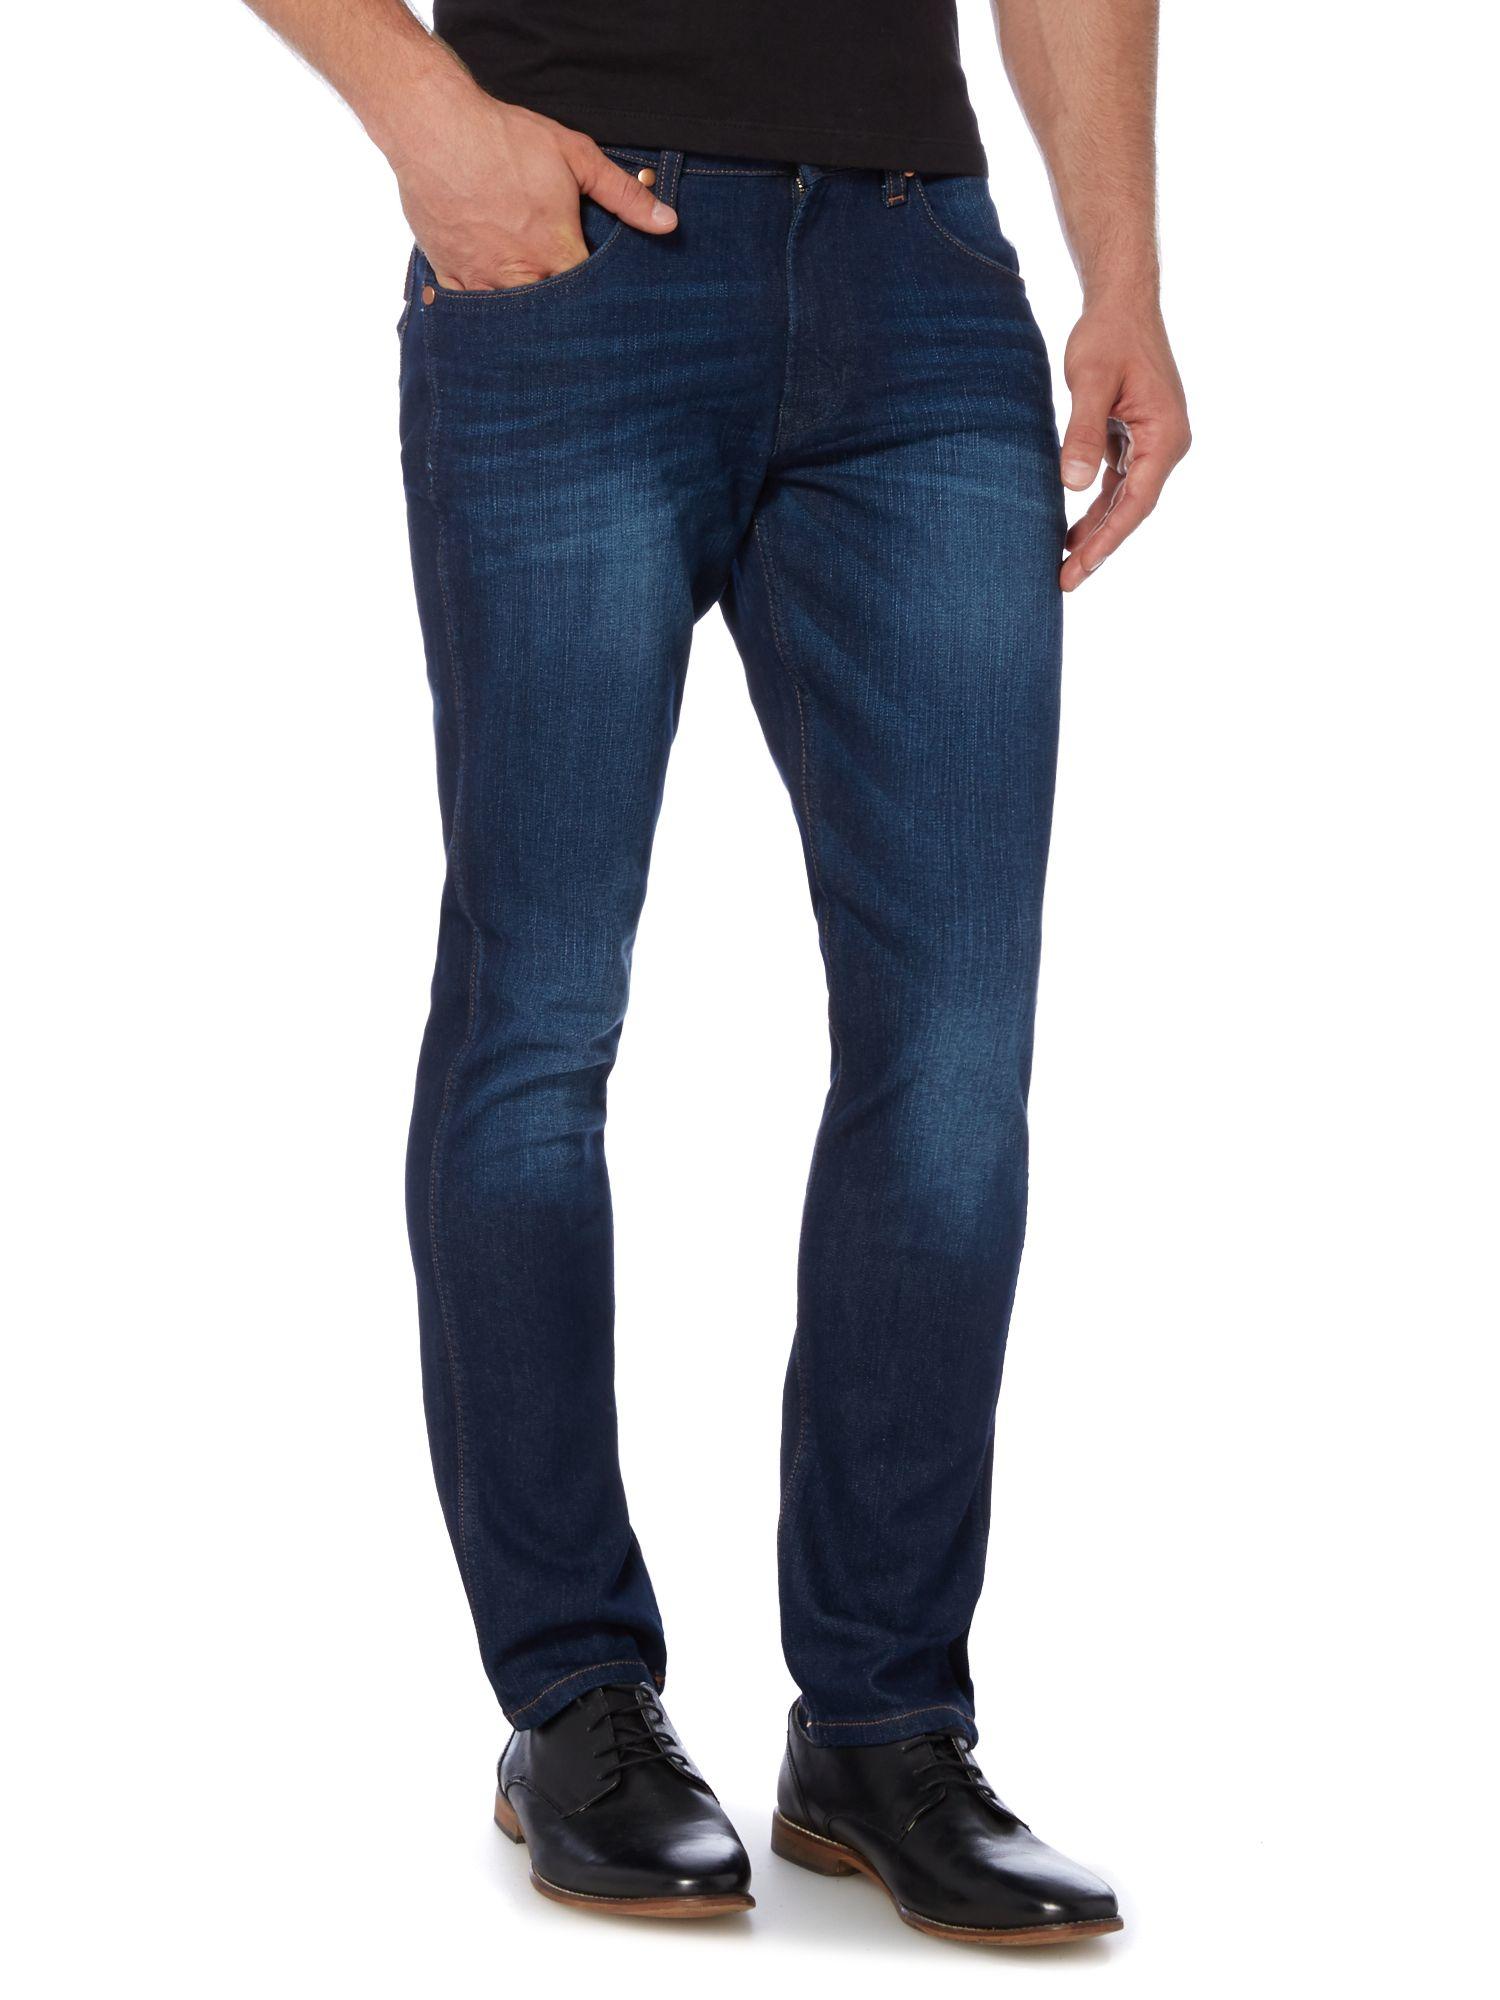 Wrangler bostin truck stop slim fit jean in blue for men for Wrangler denim shirts uk